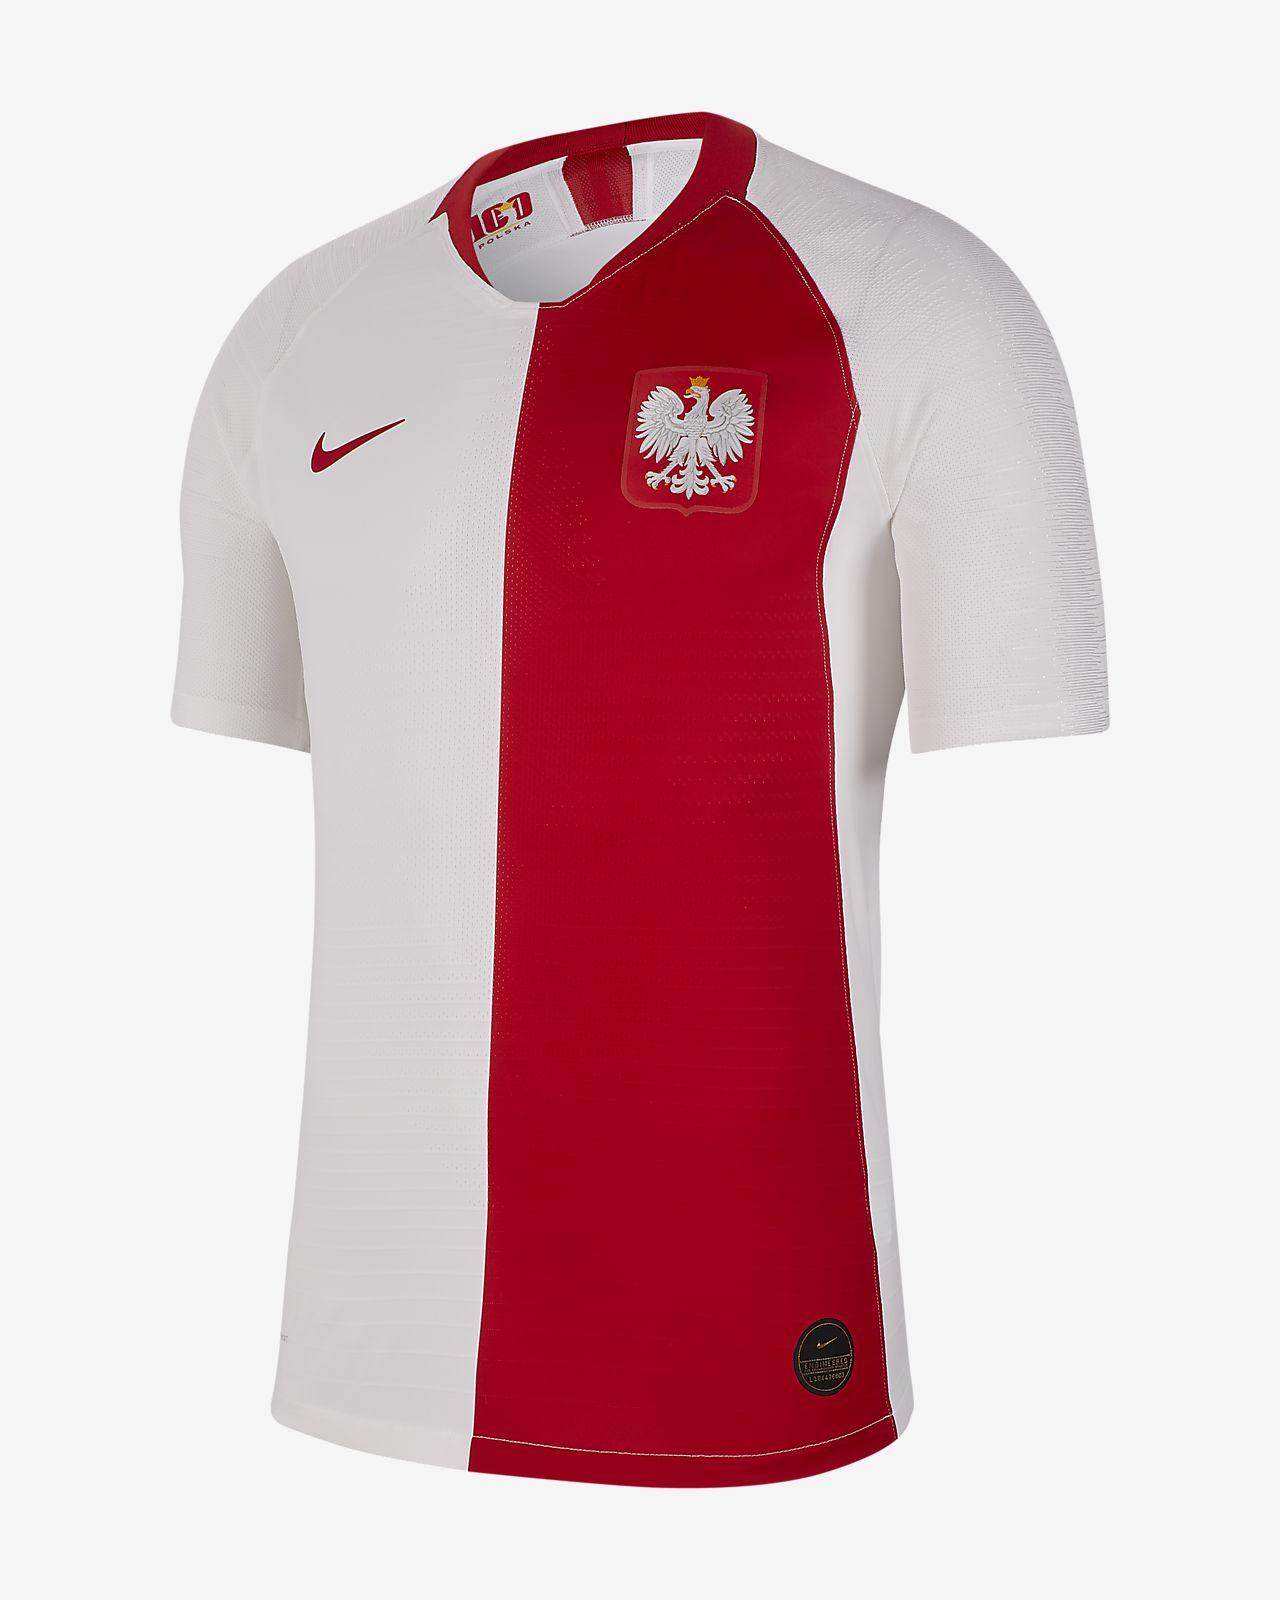 Maillot Poland Vapor Match Centennial pour Homme